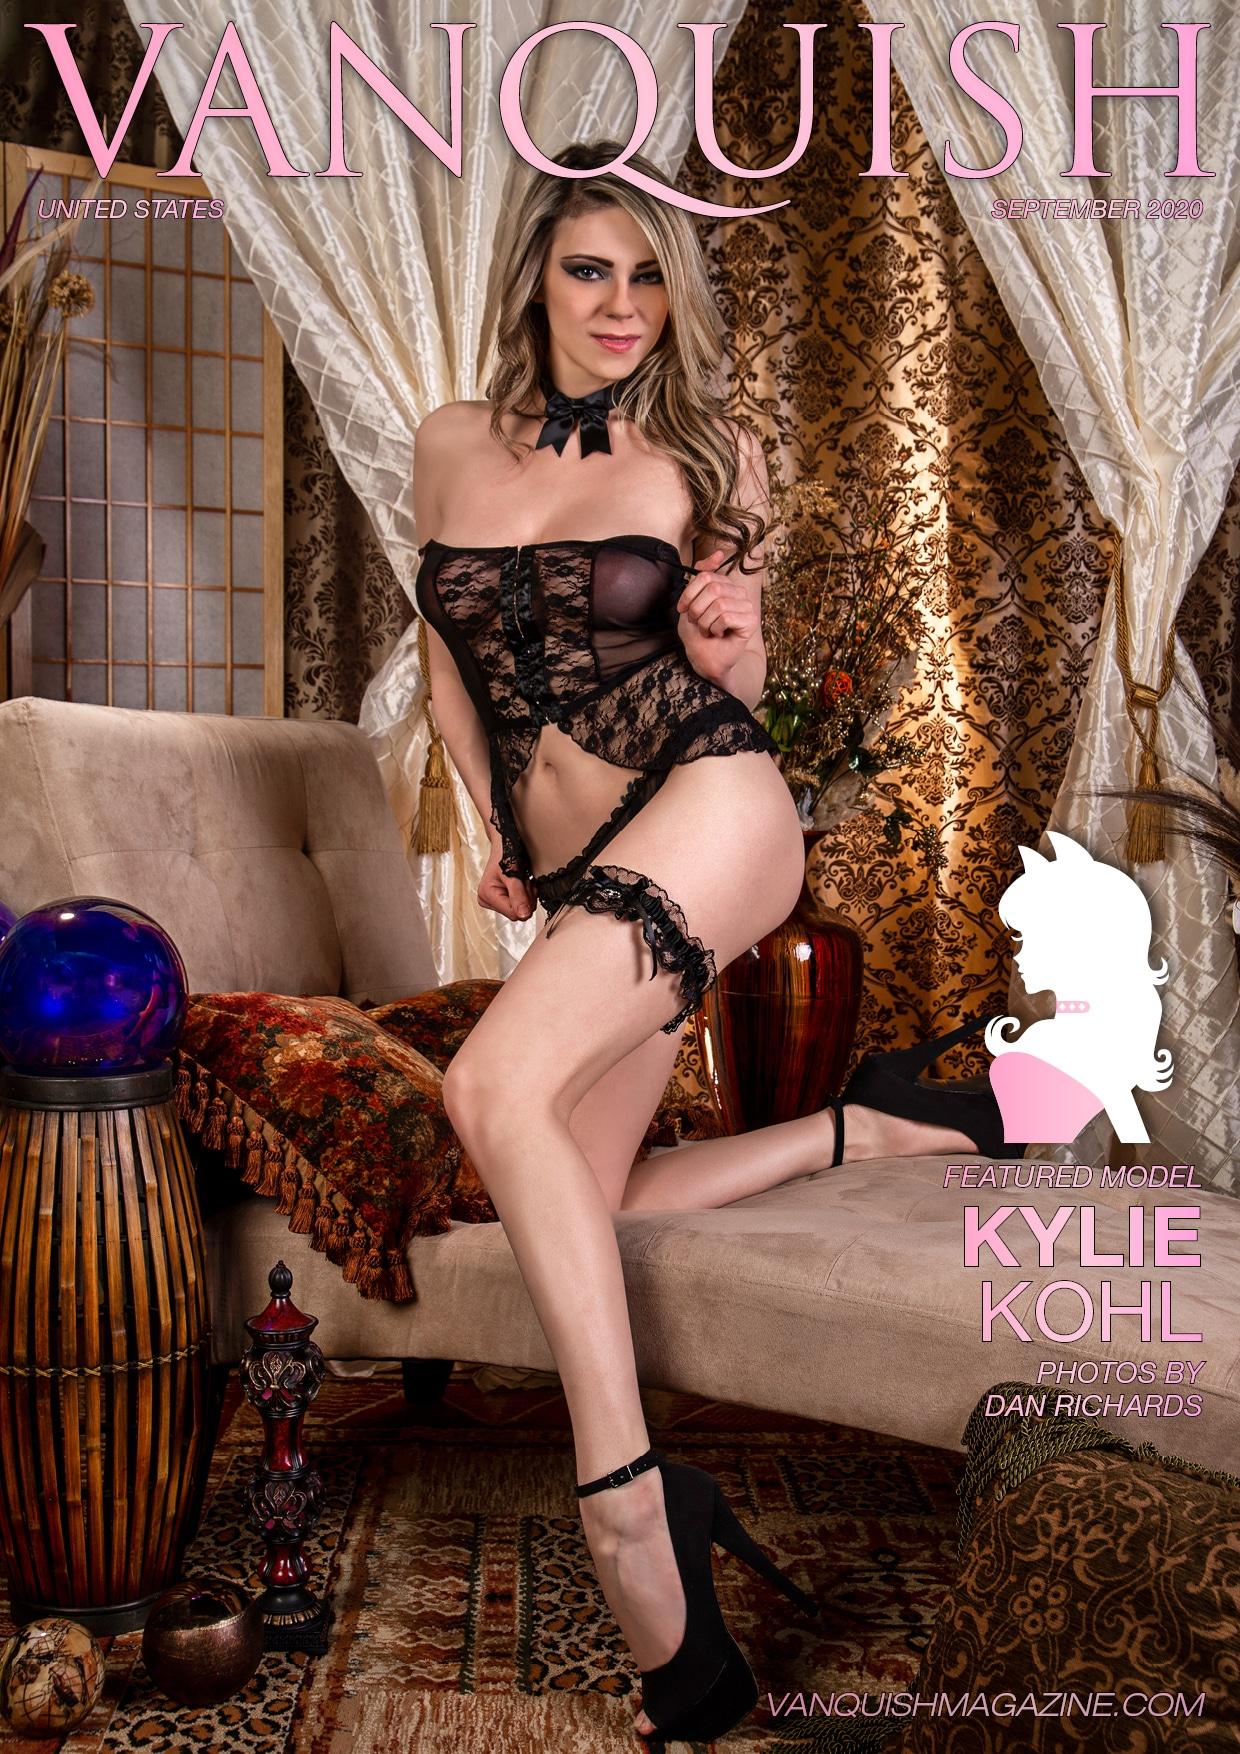 Vanquish Magazine - September 2020 - Kylie Kohl